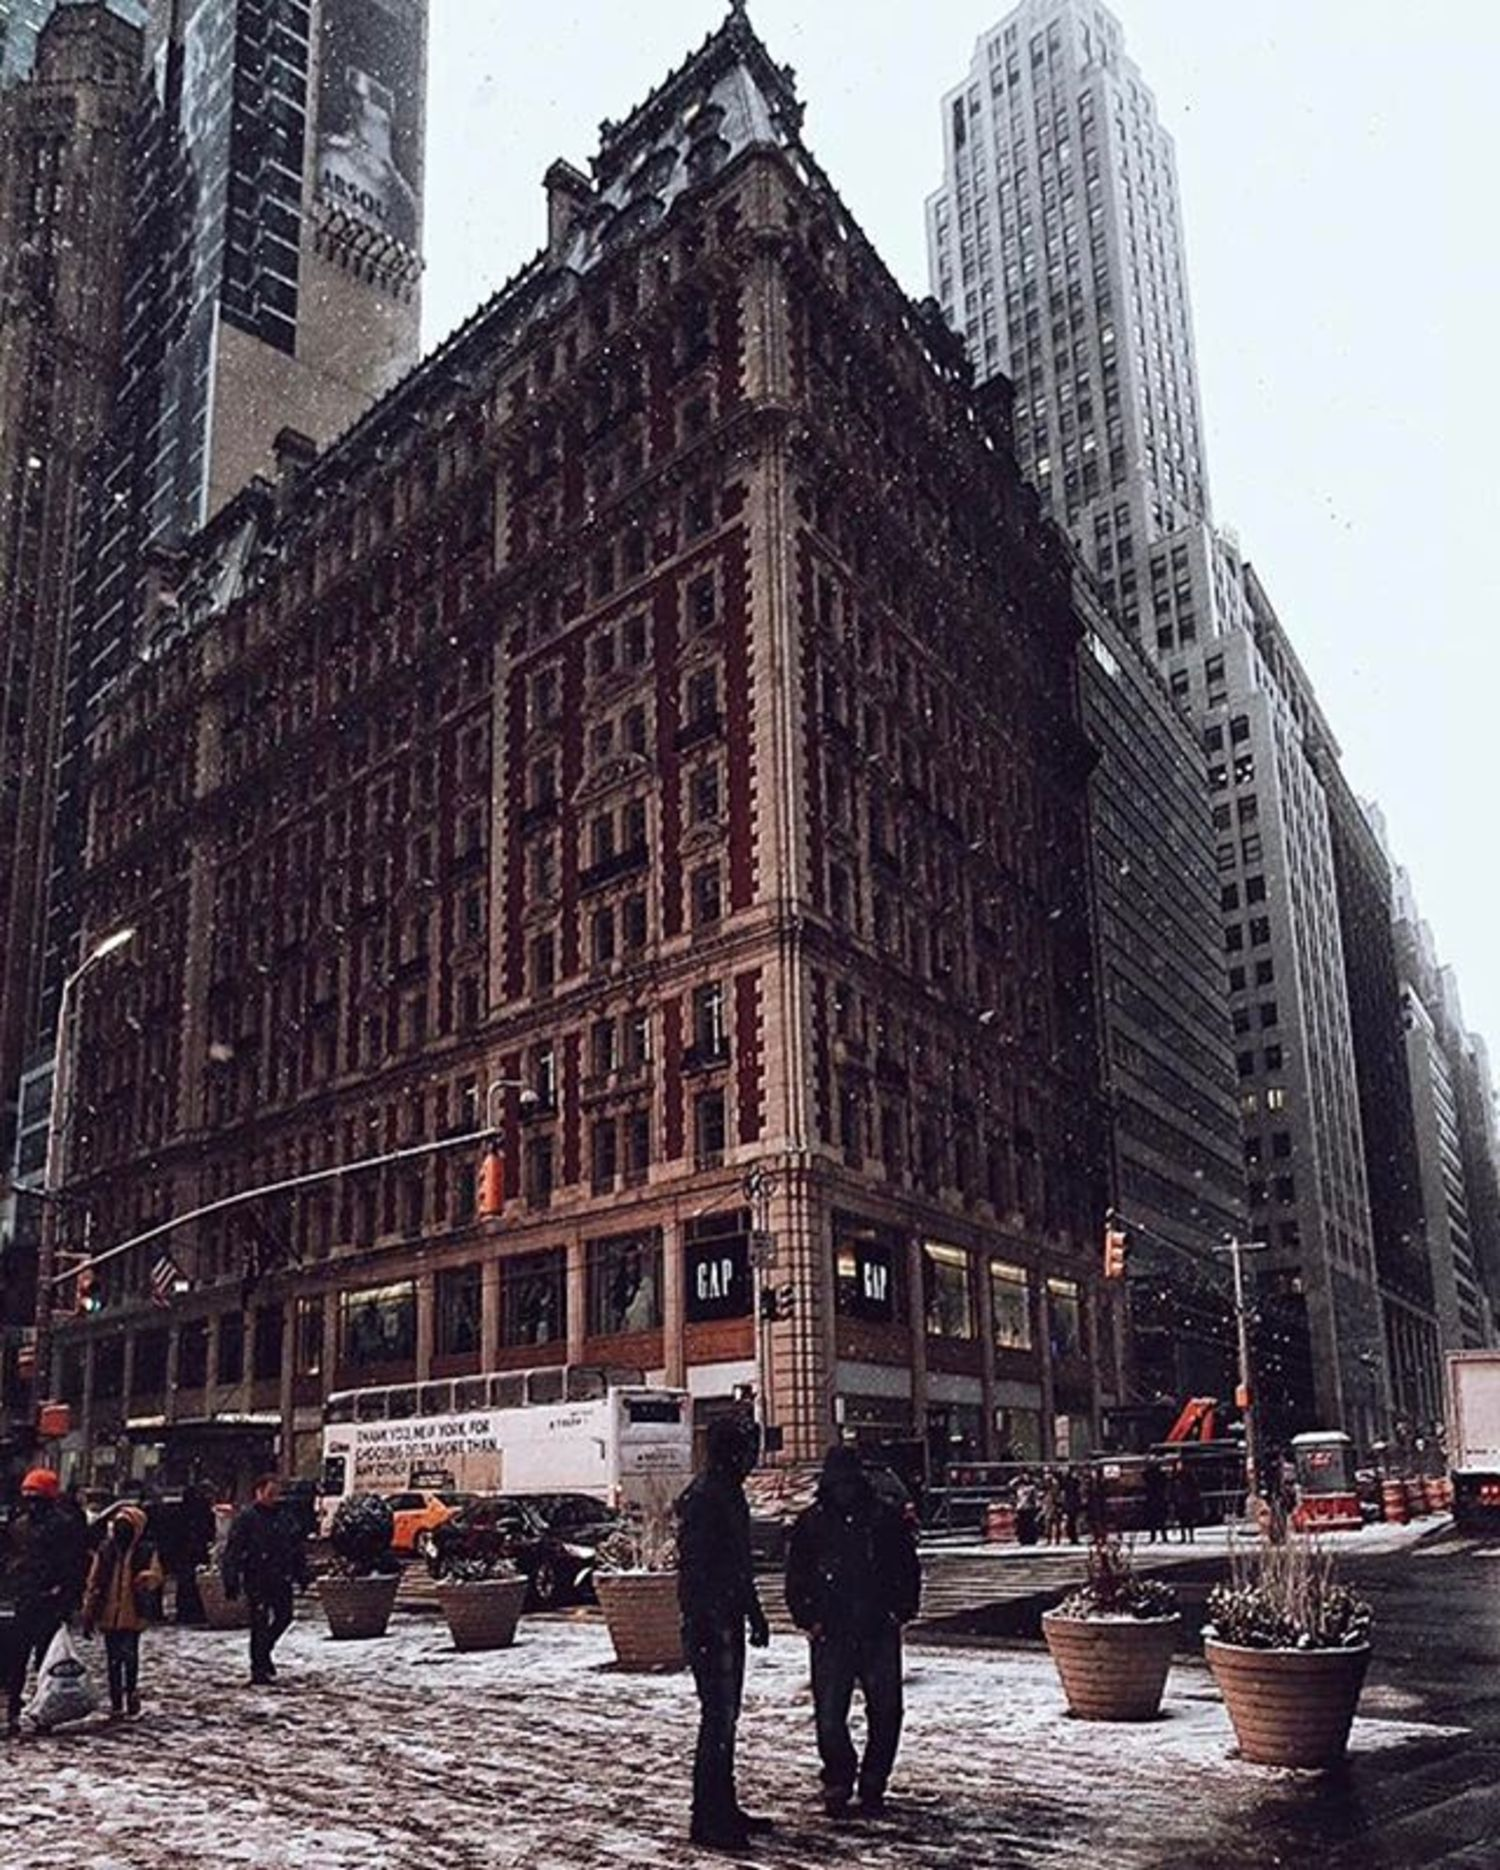 Photo via @fliickman  Knickerbocker Hotel, Midtown  #viewingnyc